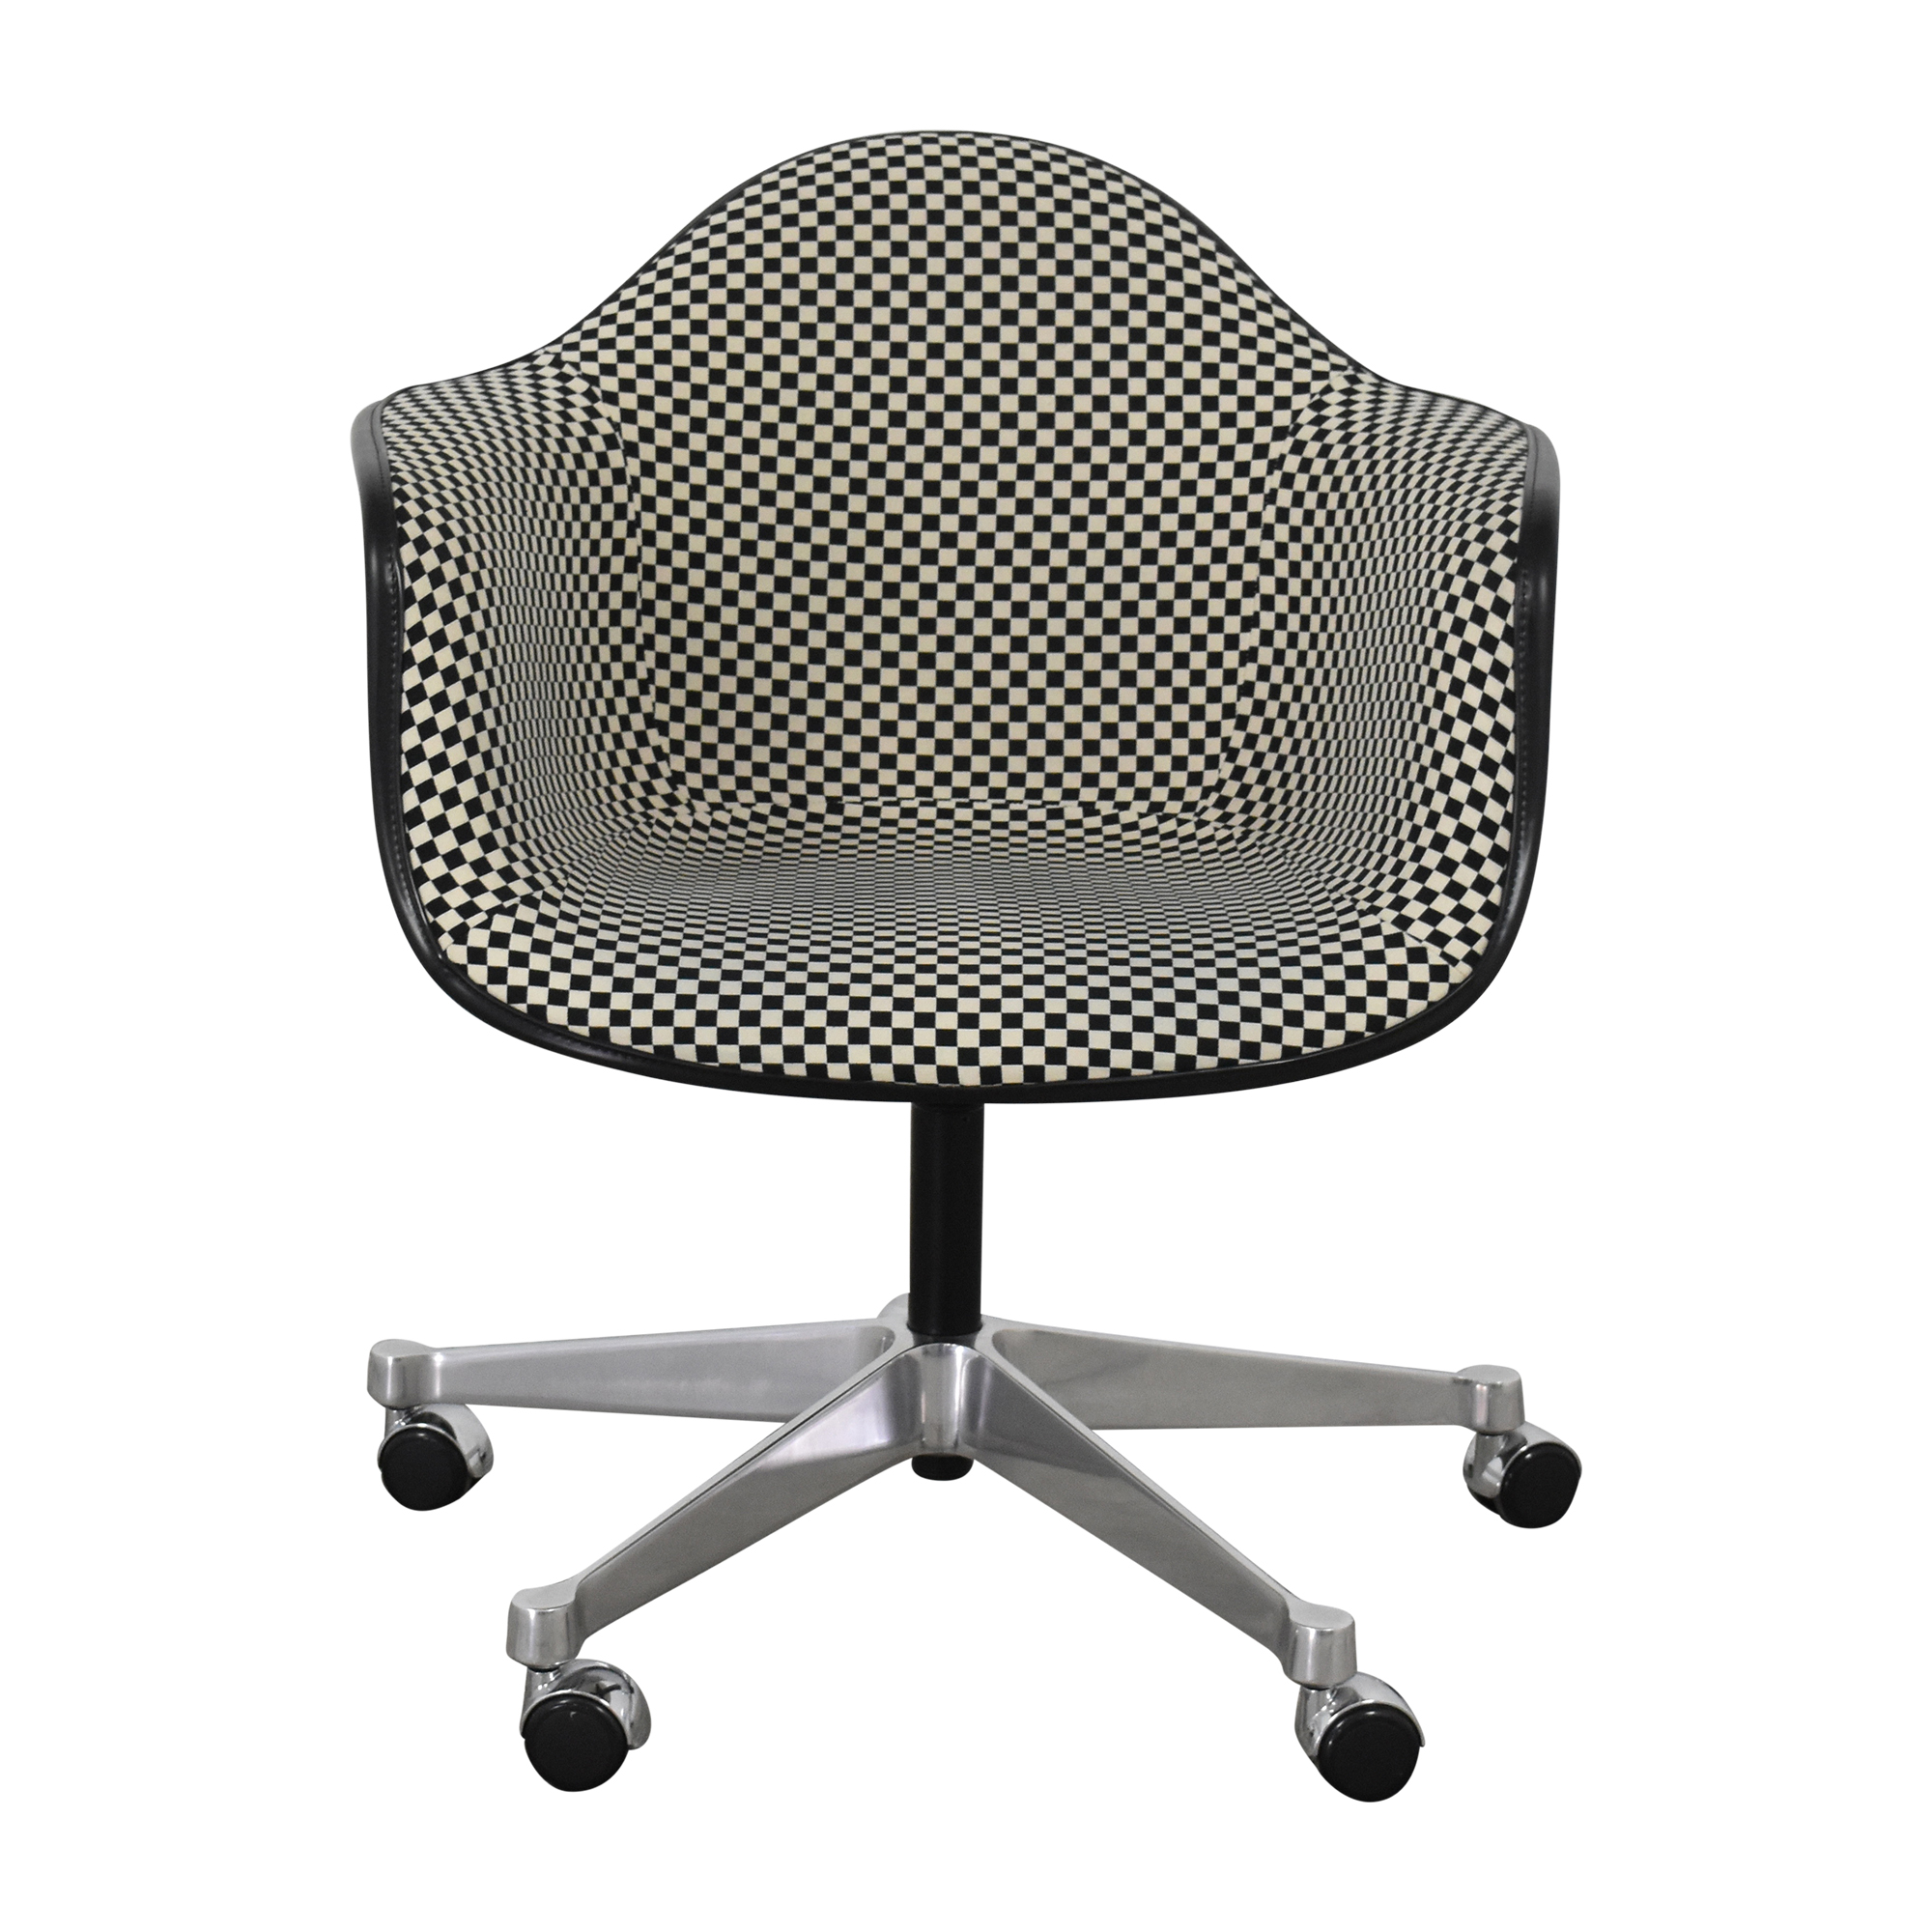 Herman Miller Herman Miller Eames Upholstered Task Chair second hand